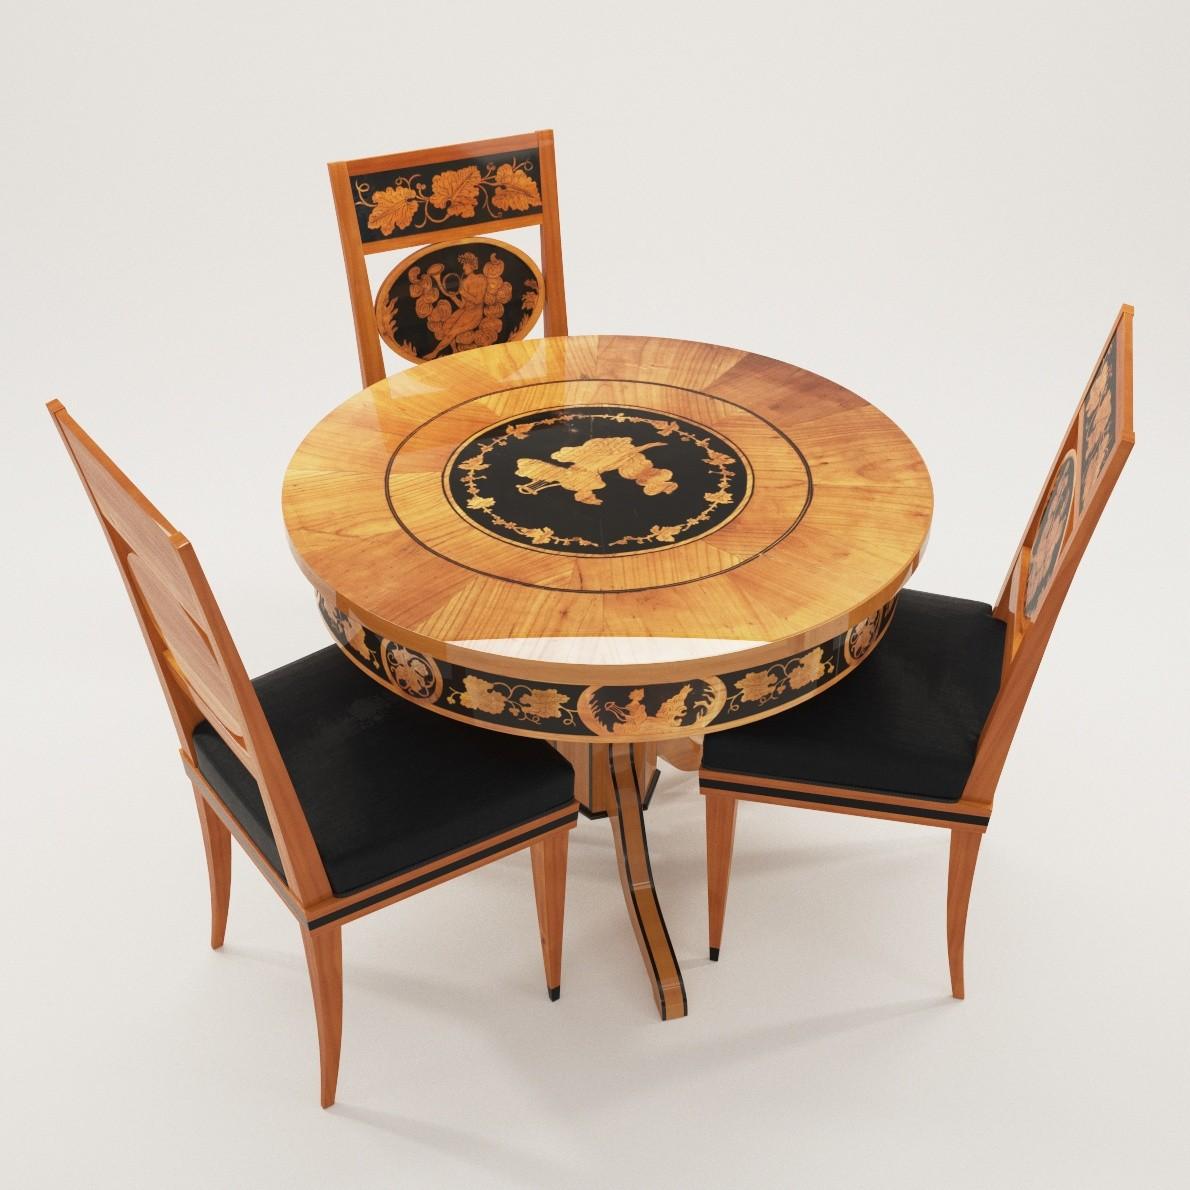 biedermeier salon table 3d realistic model artium3d. Black Bedroom Furniture Sets. Home Design Ideas